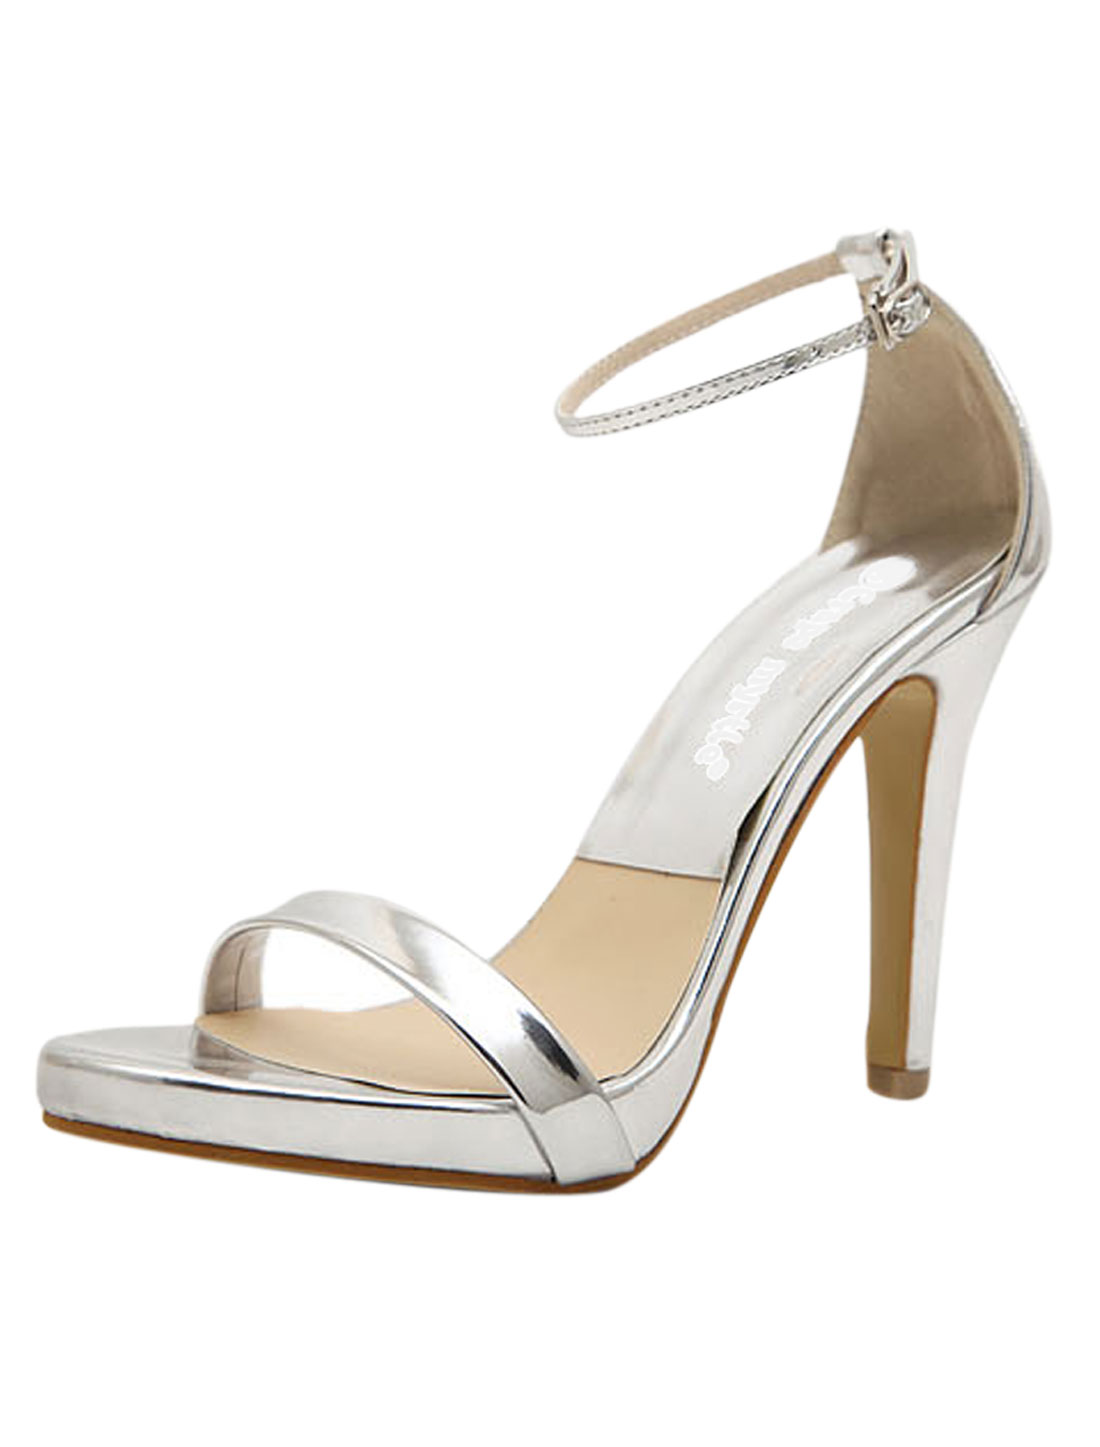 Ladies Open Toe Slim Ankle Strap Sandals Siver Tone US 7